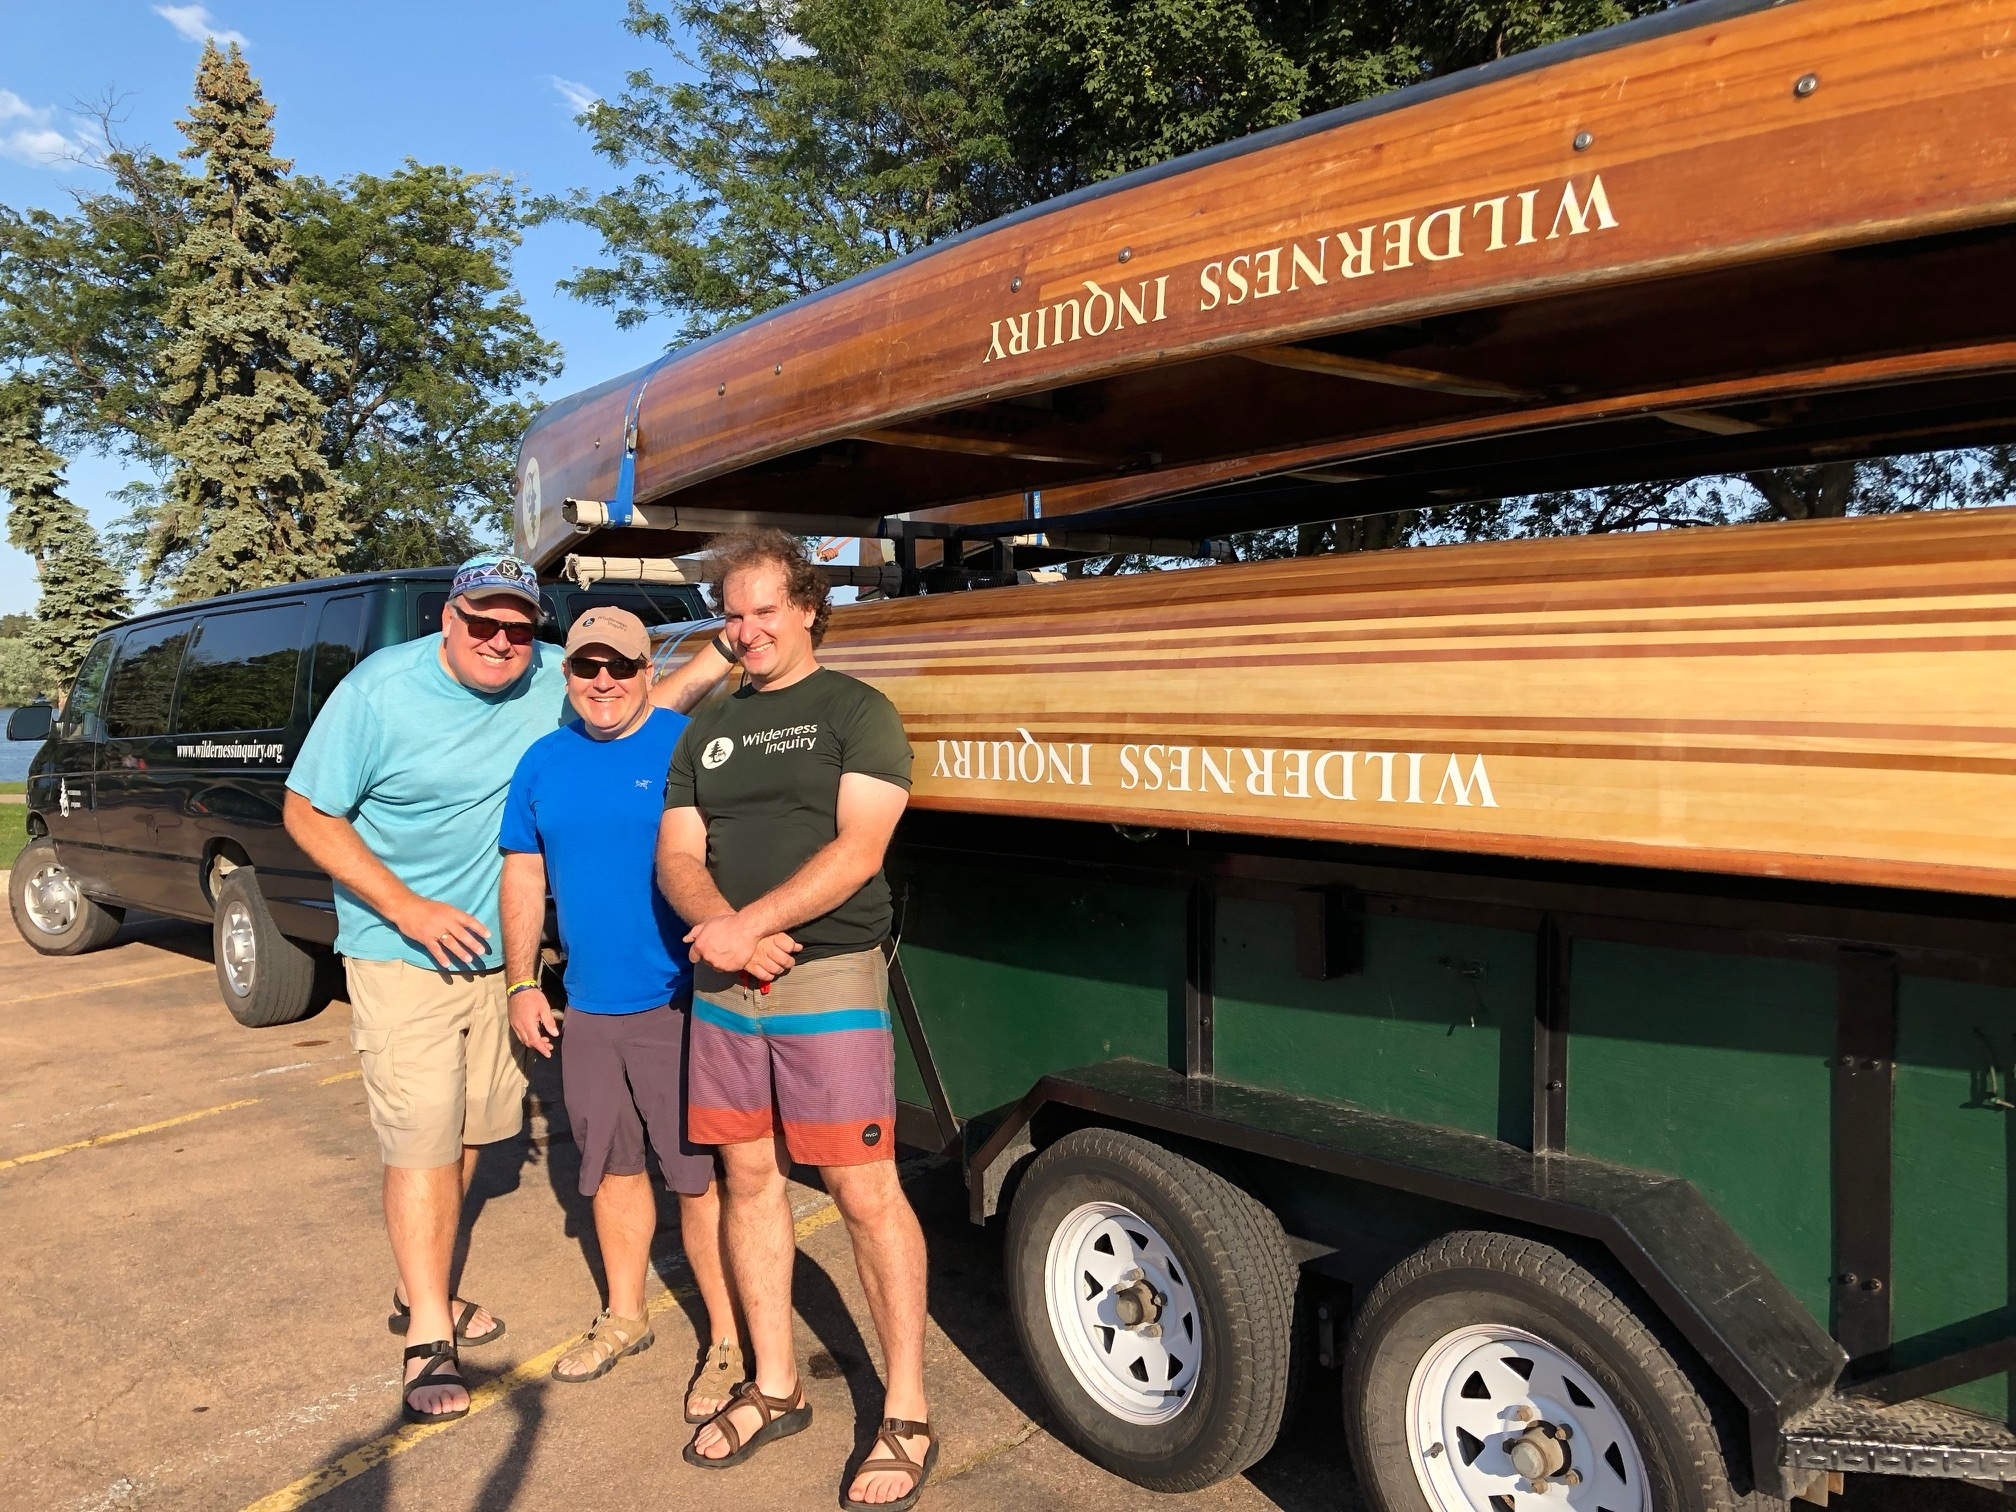 Canoemobile -